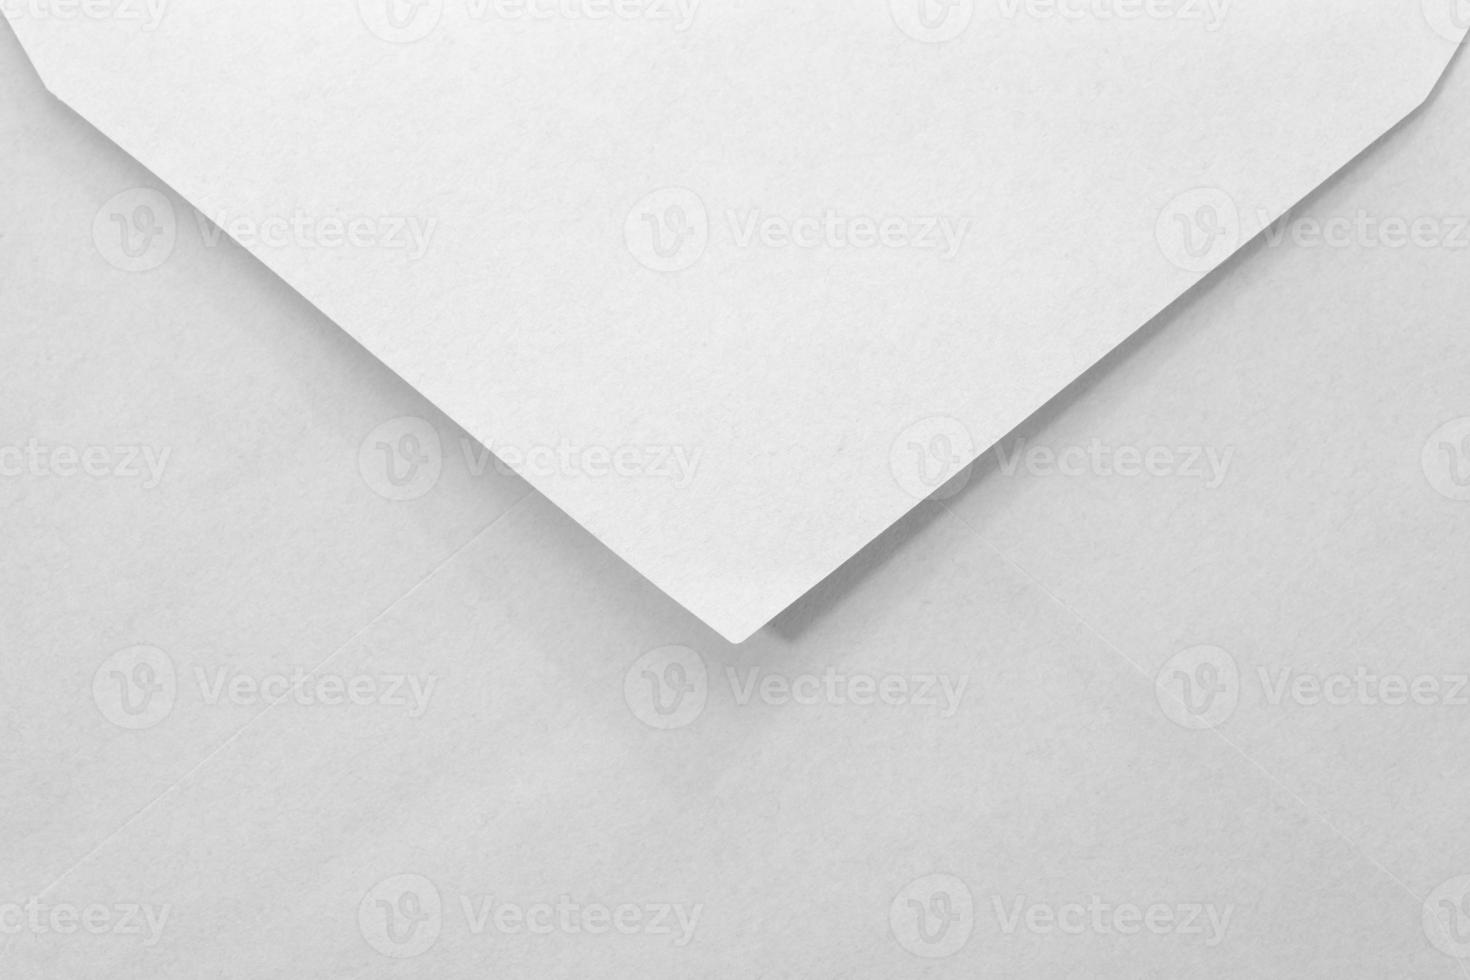 close - up empty white paper envelope photo